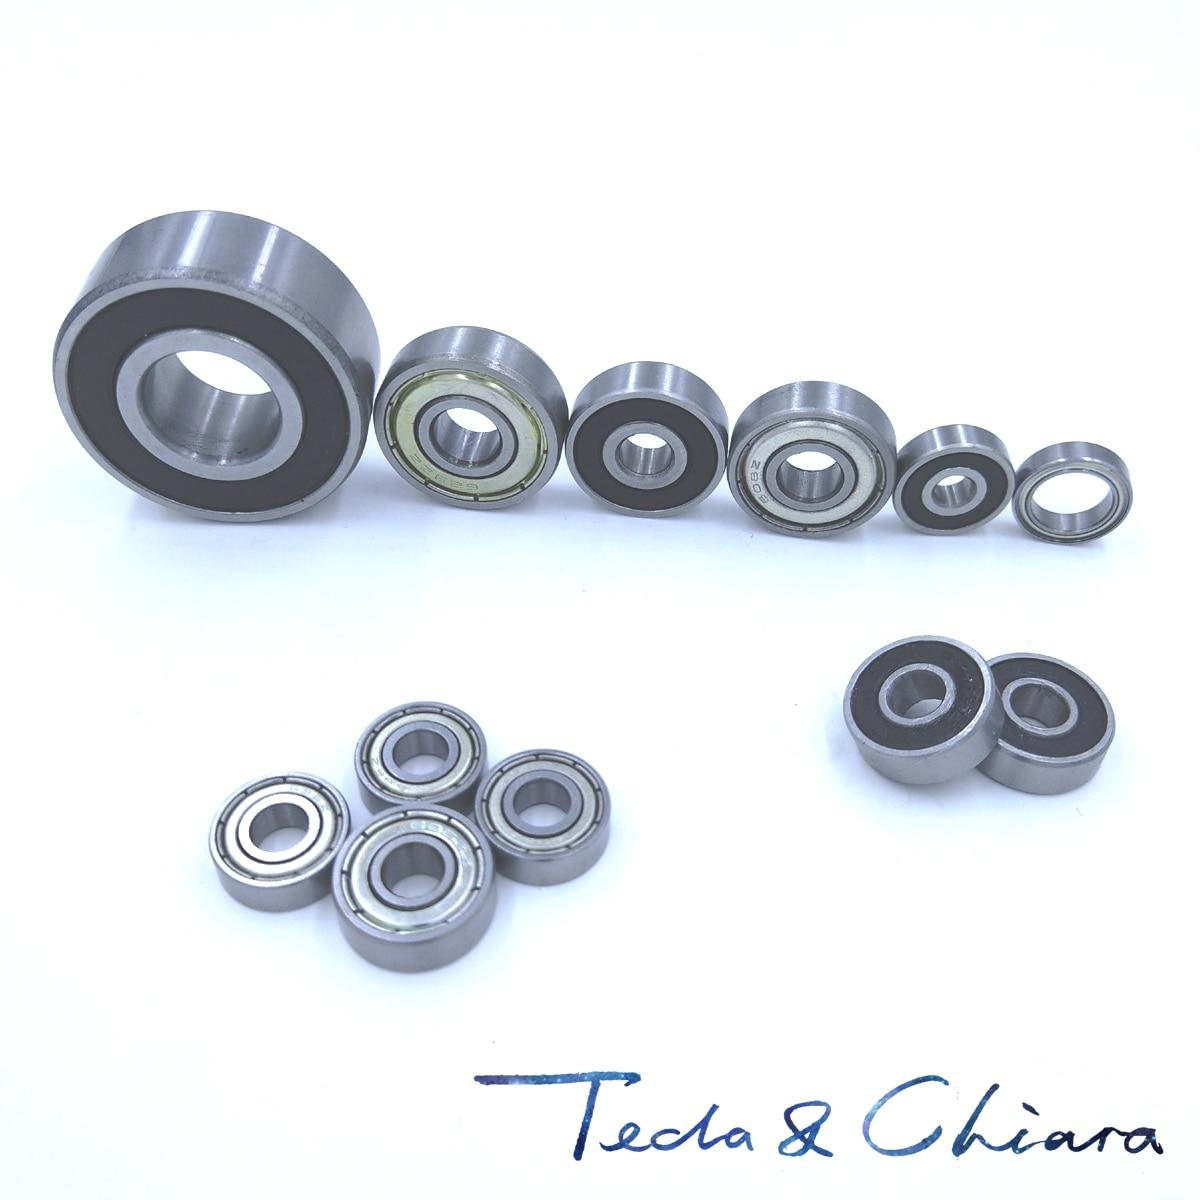 638 638ZZ 638RS 638-2Z 638Z 638-2RS ZZ RS RZ 2RZ Deep Groove Ball Bearings 8 x 28 x 9mm High Quality